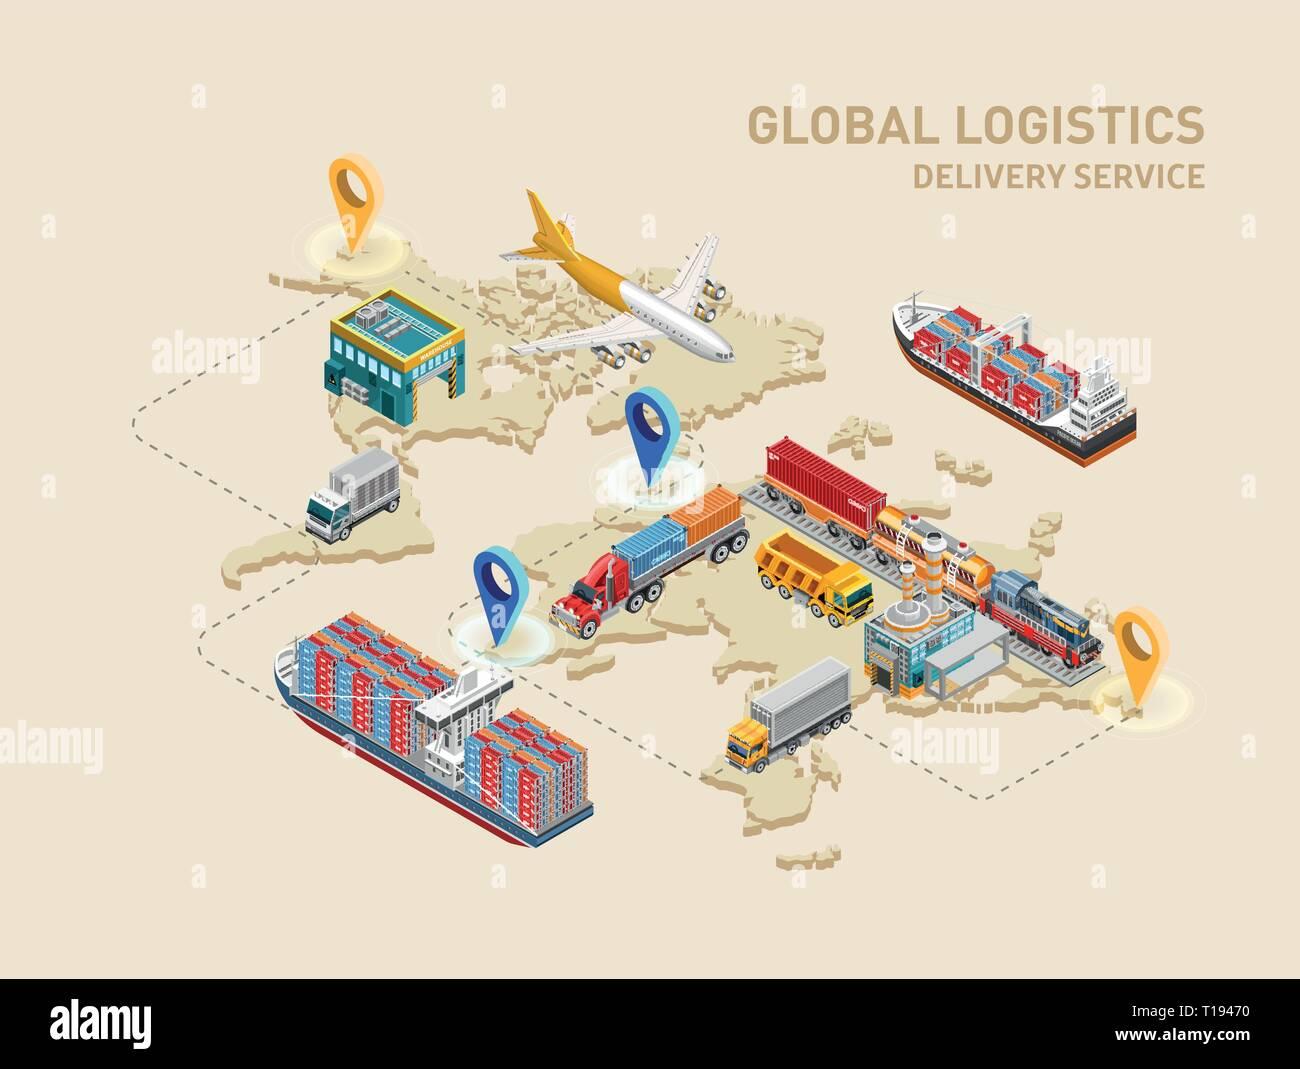 Global logistics scheme with destination points - Stock Vector